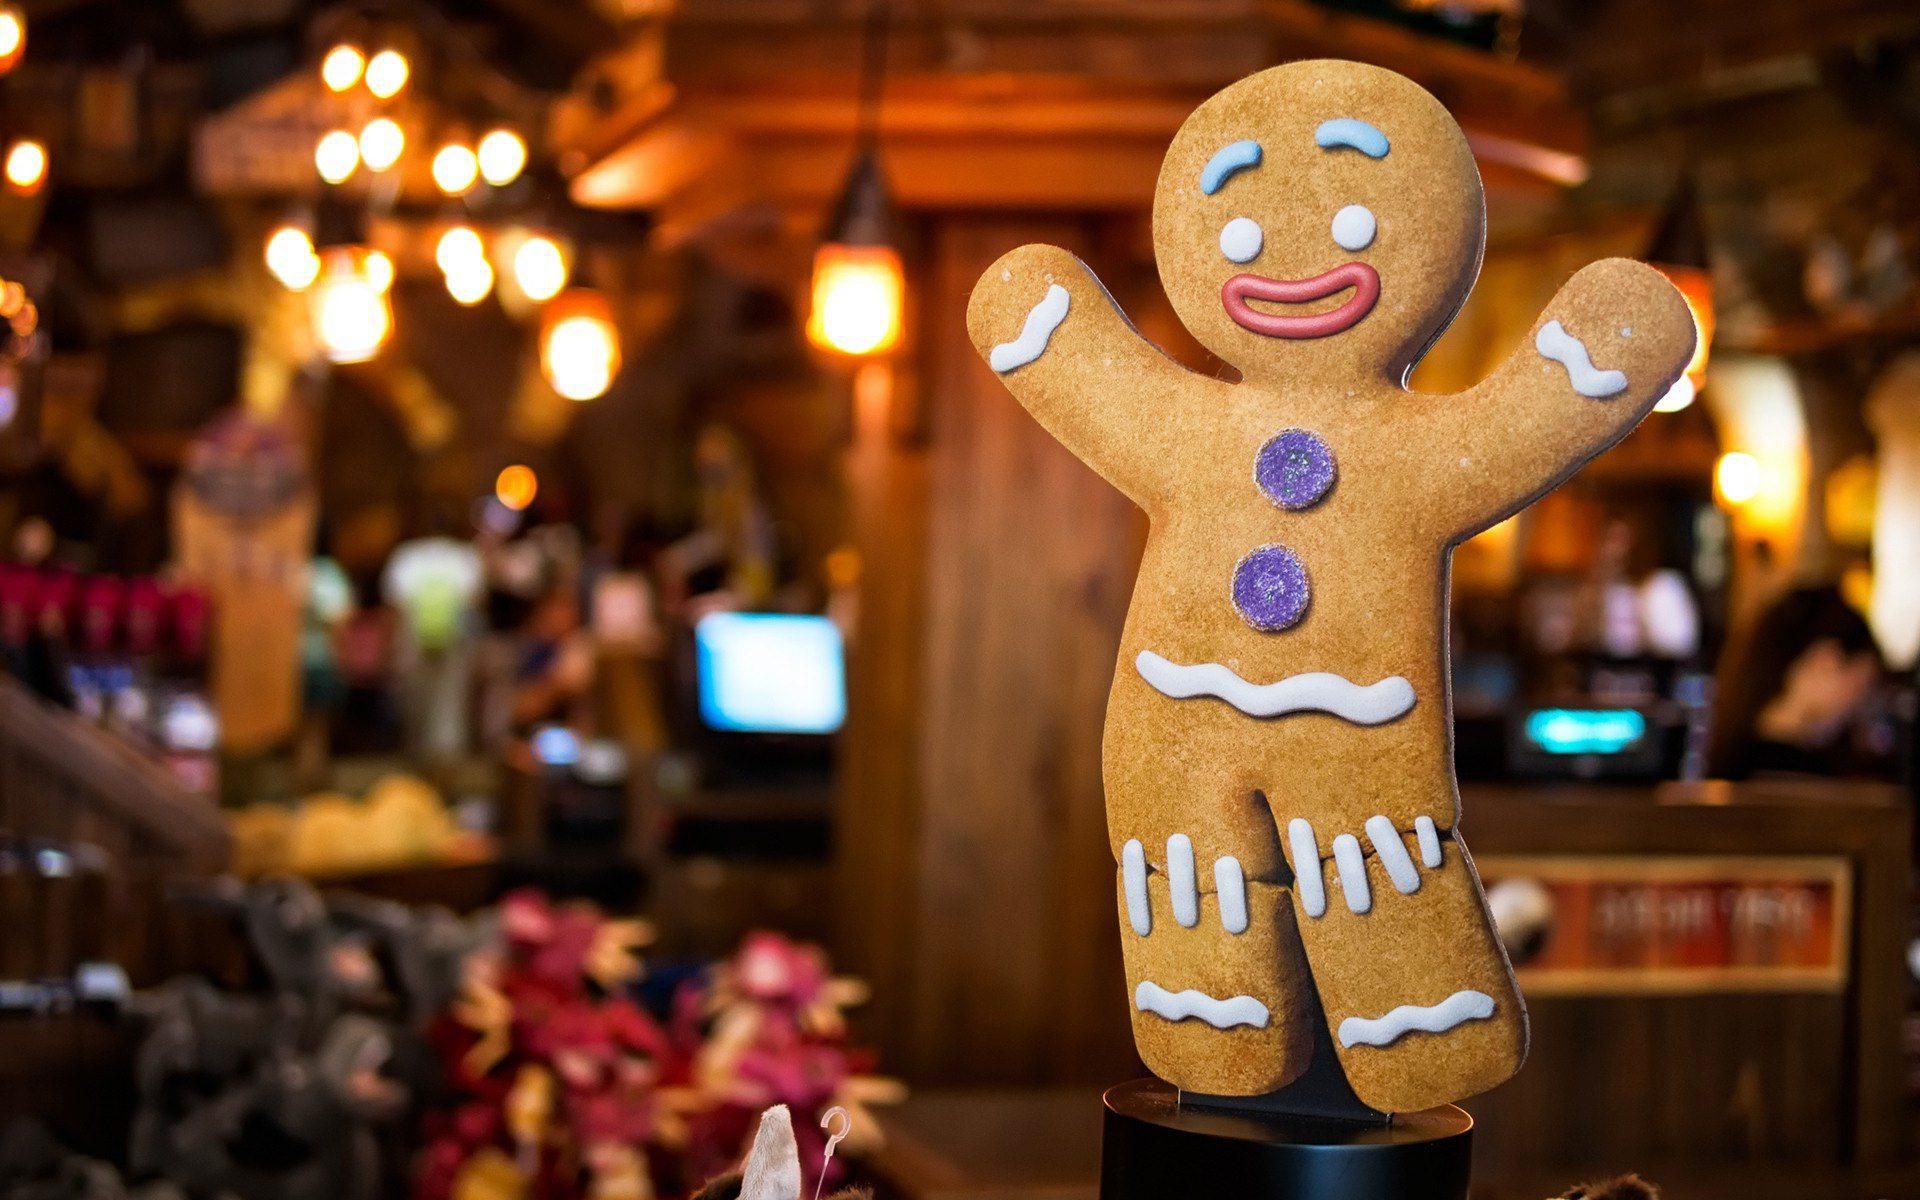 Gingerbread Man Wallpapers   Wallpaper Cave